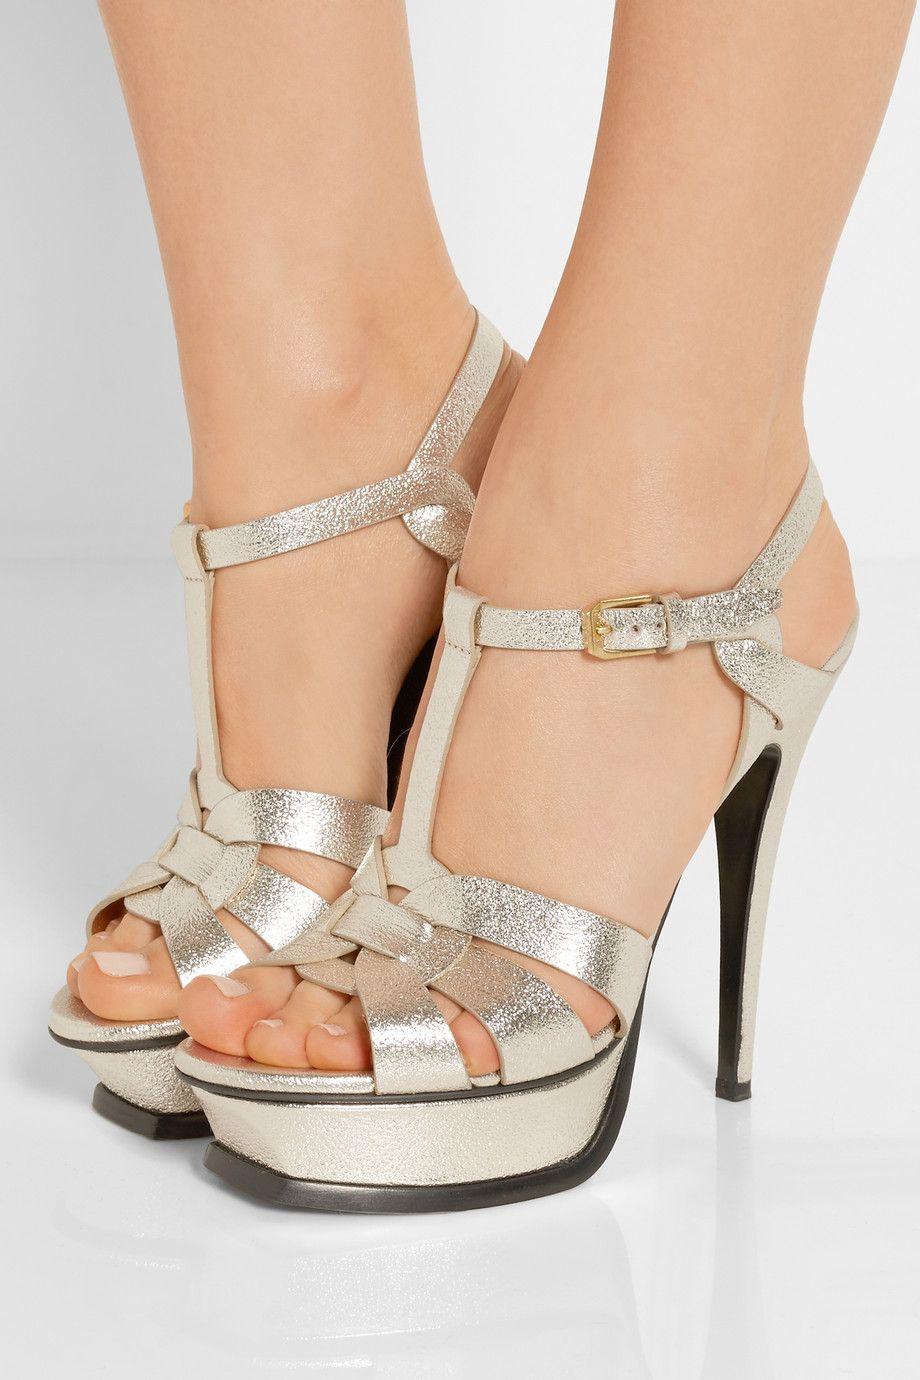 075625c5c1123f SAINT LAURENT Tribute metallic textured-leather platform sandals ...